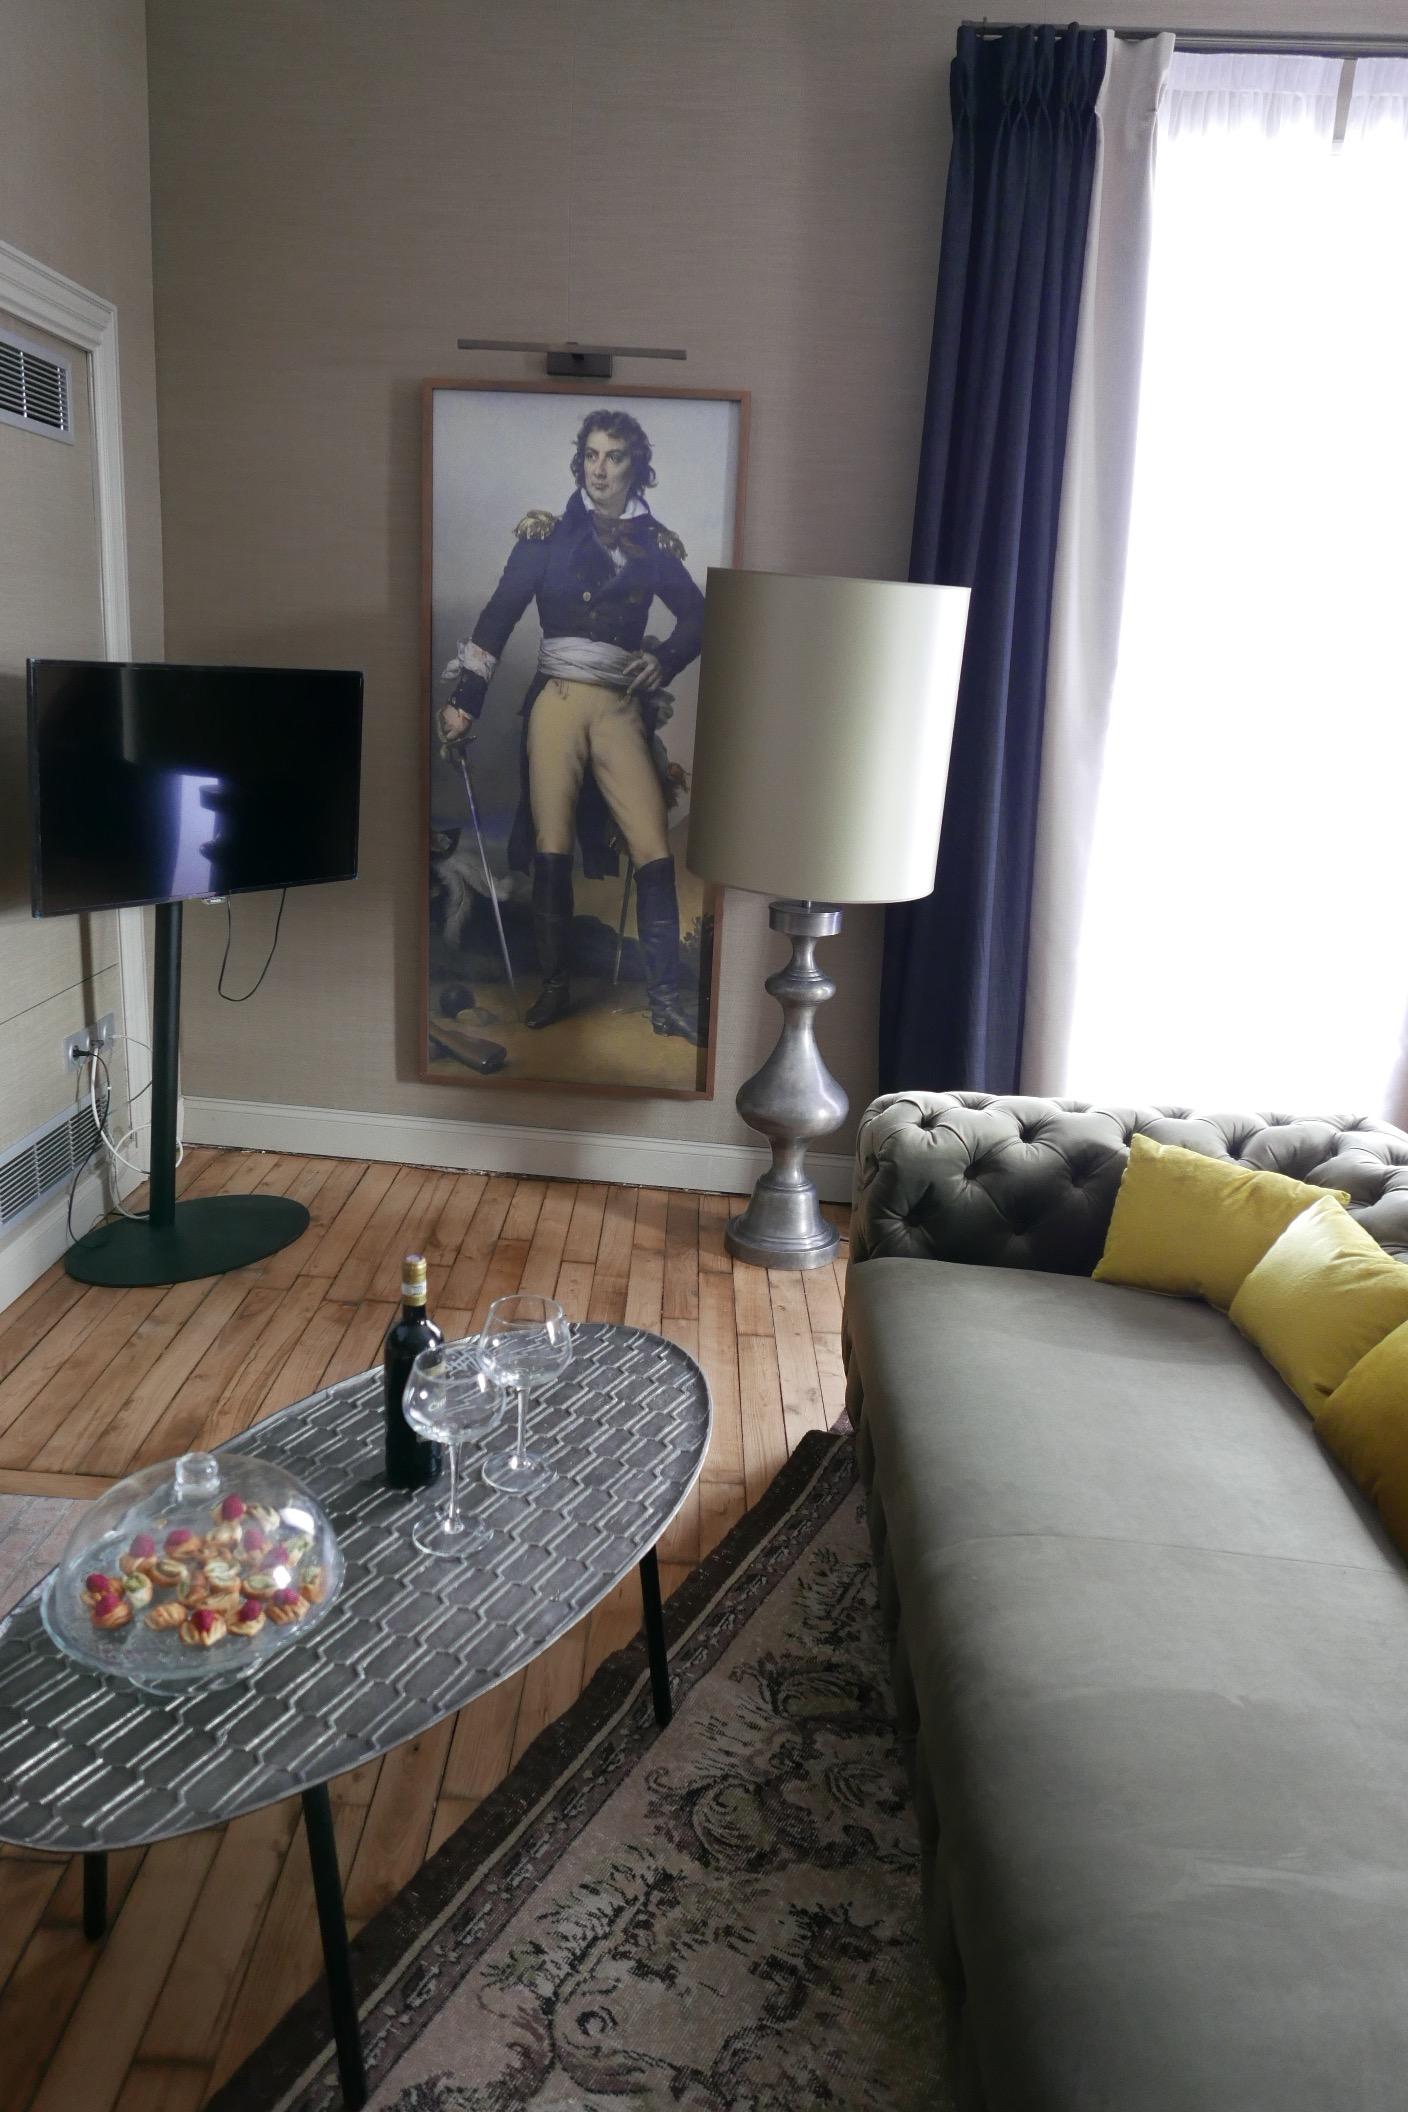 le g n ral d 39 elb e h tel noirmoutier en l 39 le une nuit et plus au g n ral d 39 elb e voyages. Black Bedroom Furniture Sets. Home Design Ideas